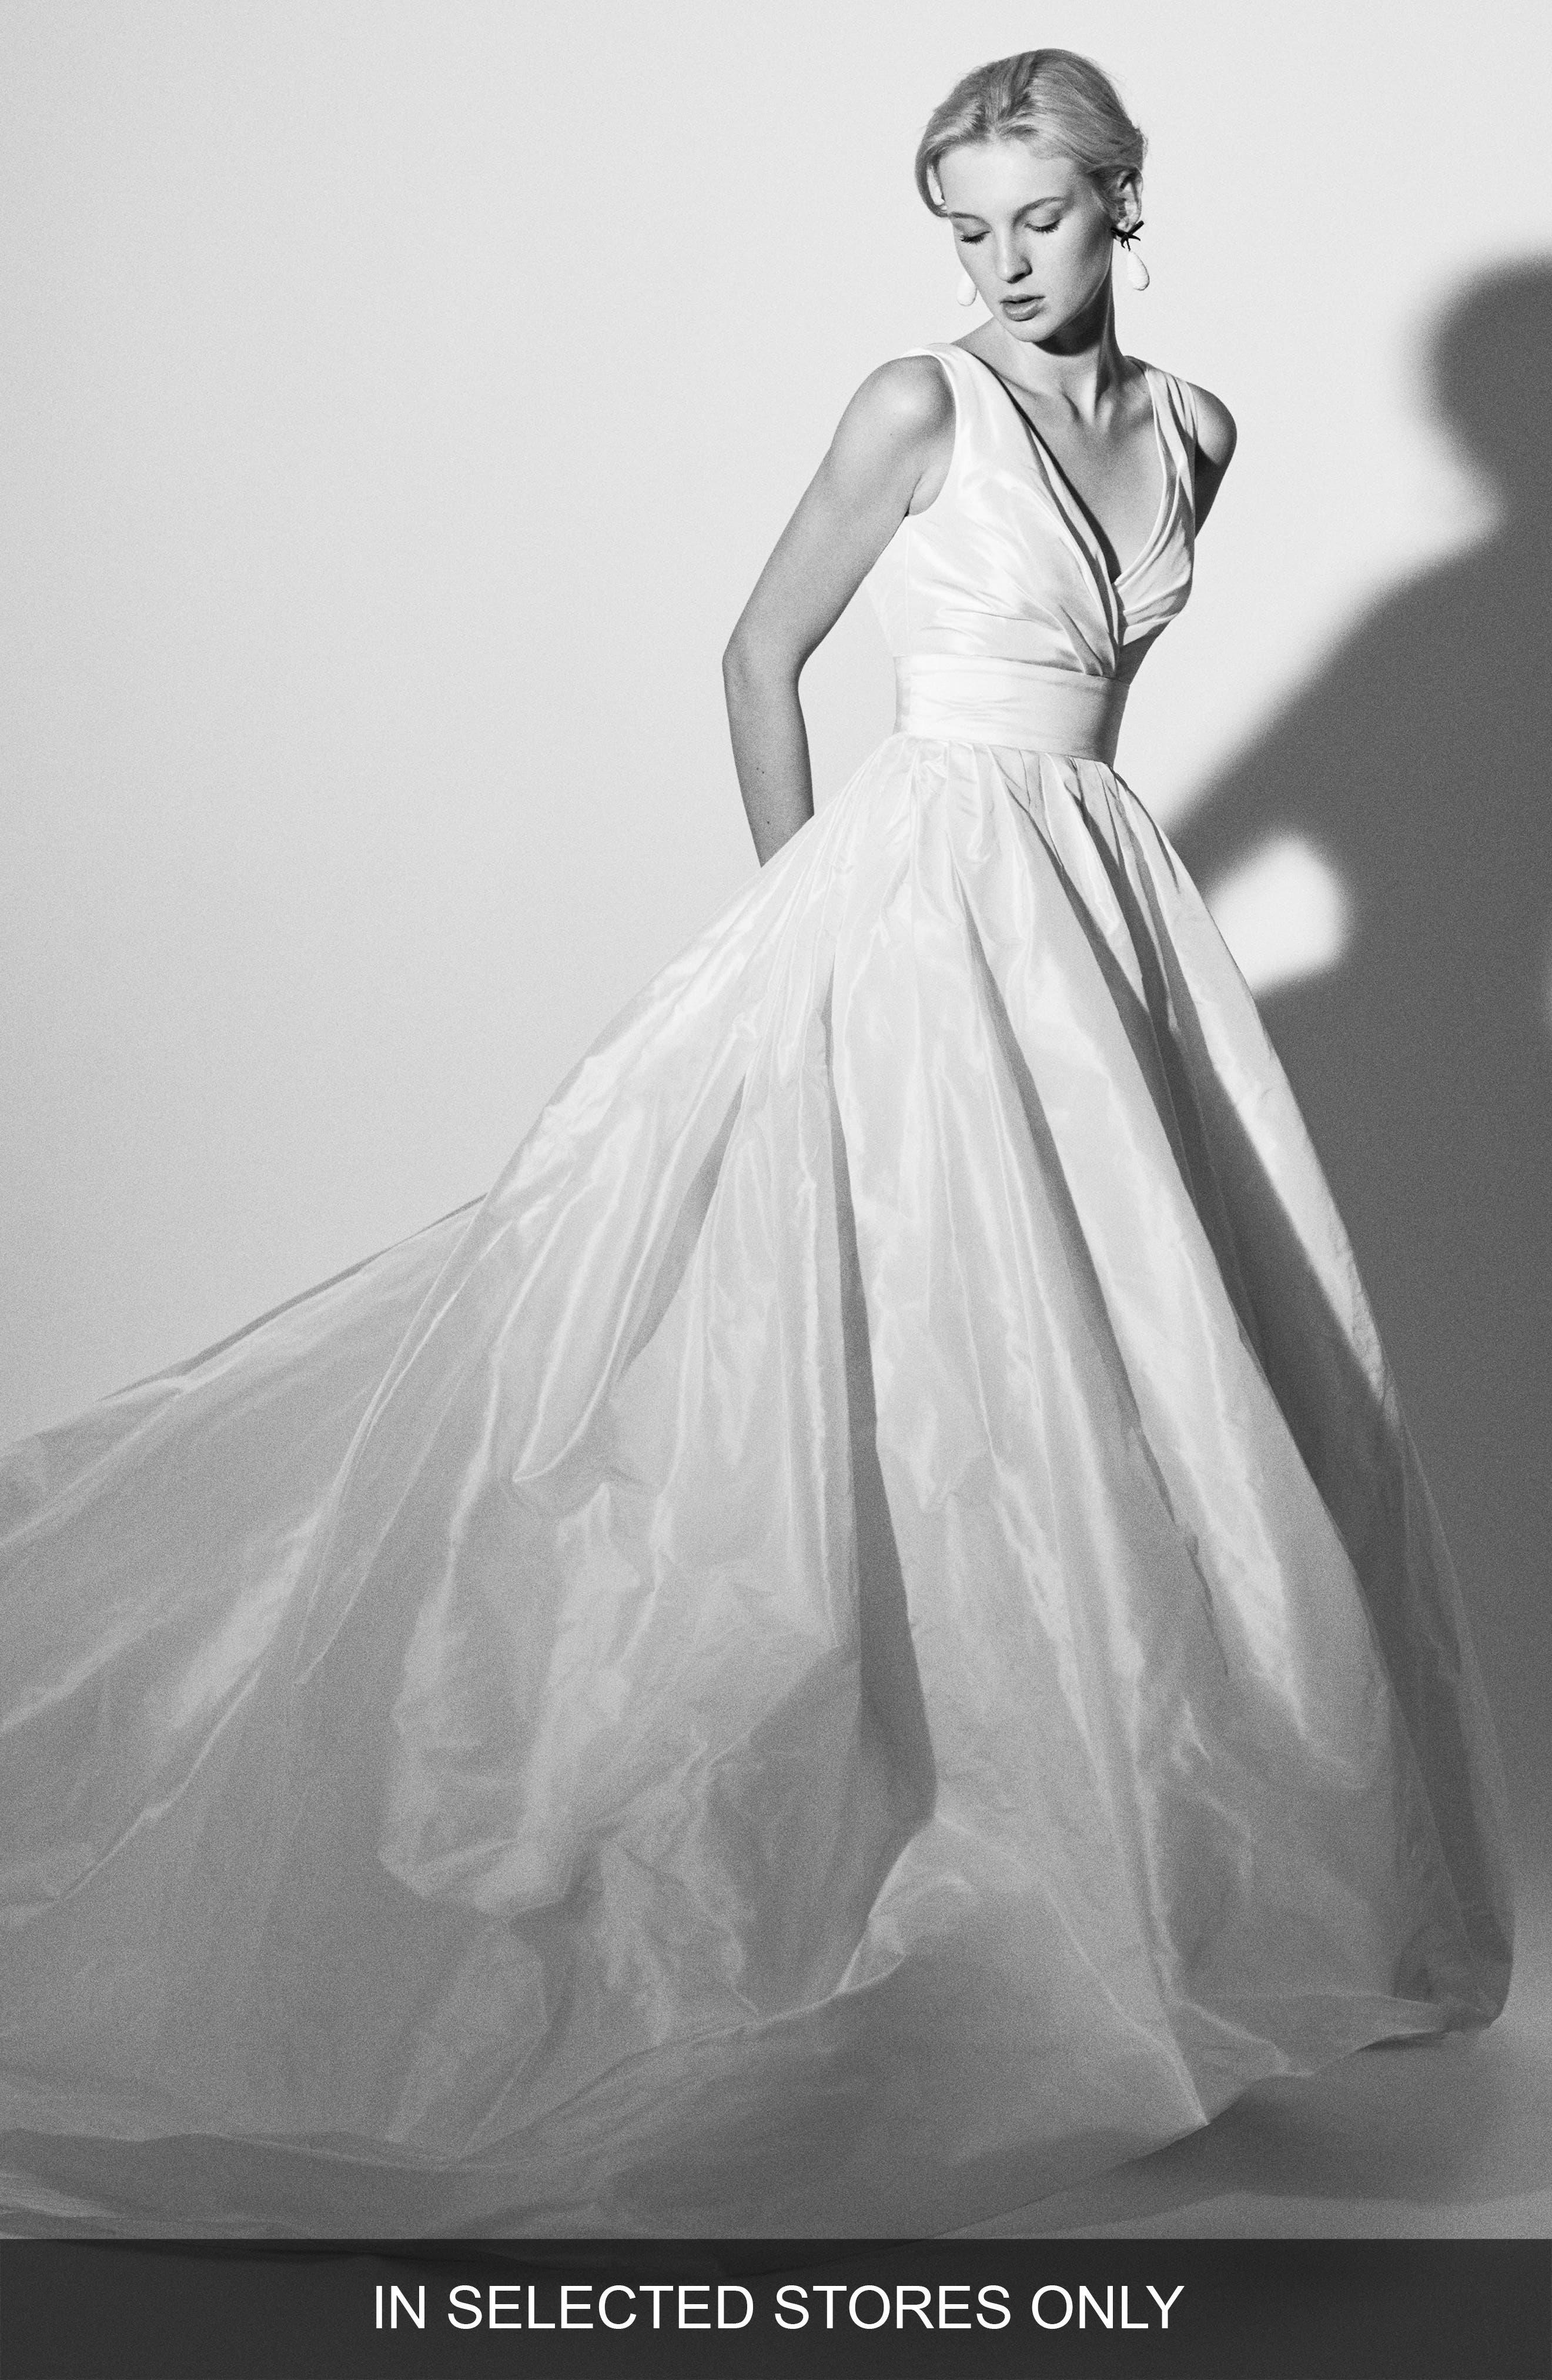 Alternate Image 1 Selected - Carolina Herrera Felisa Silk Taffeta Ballgown